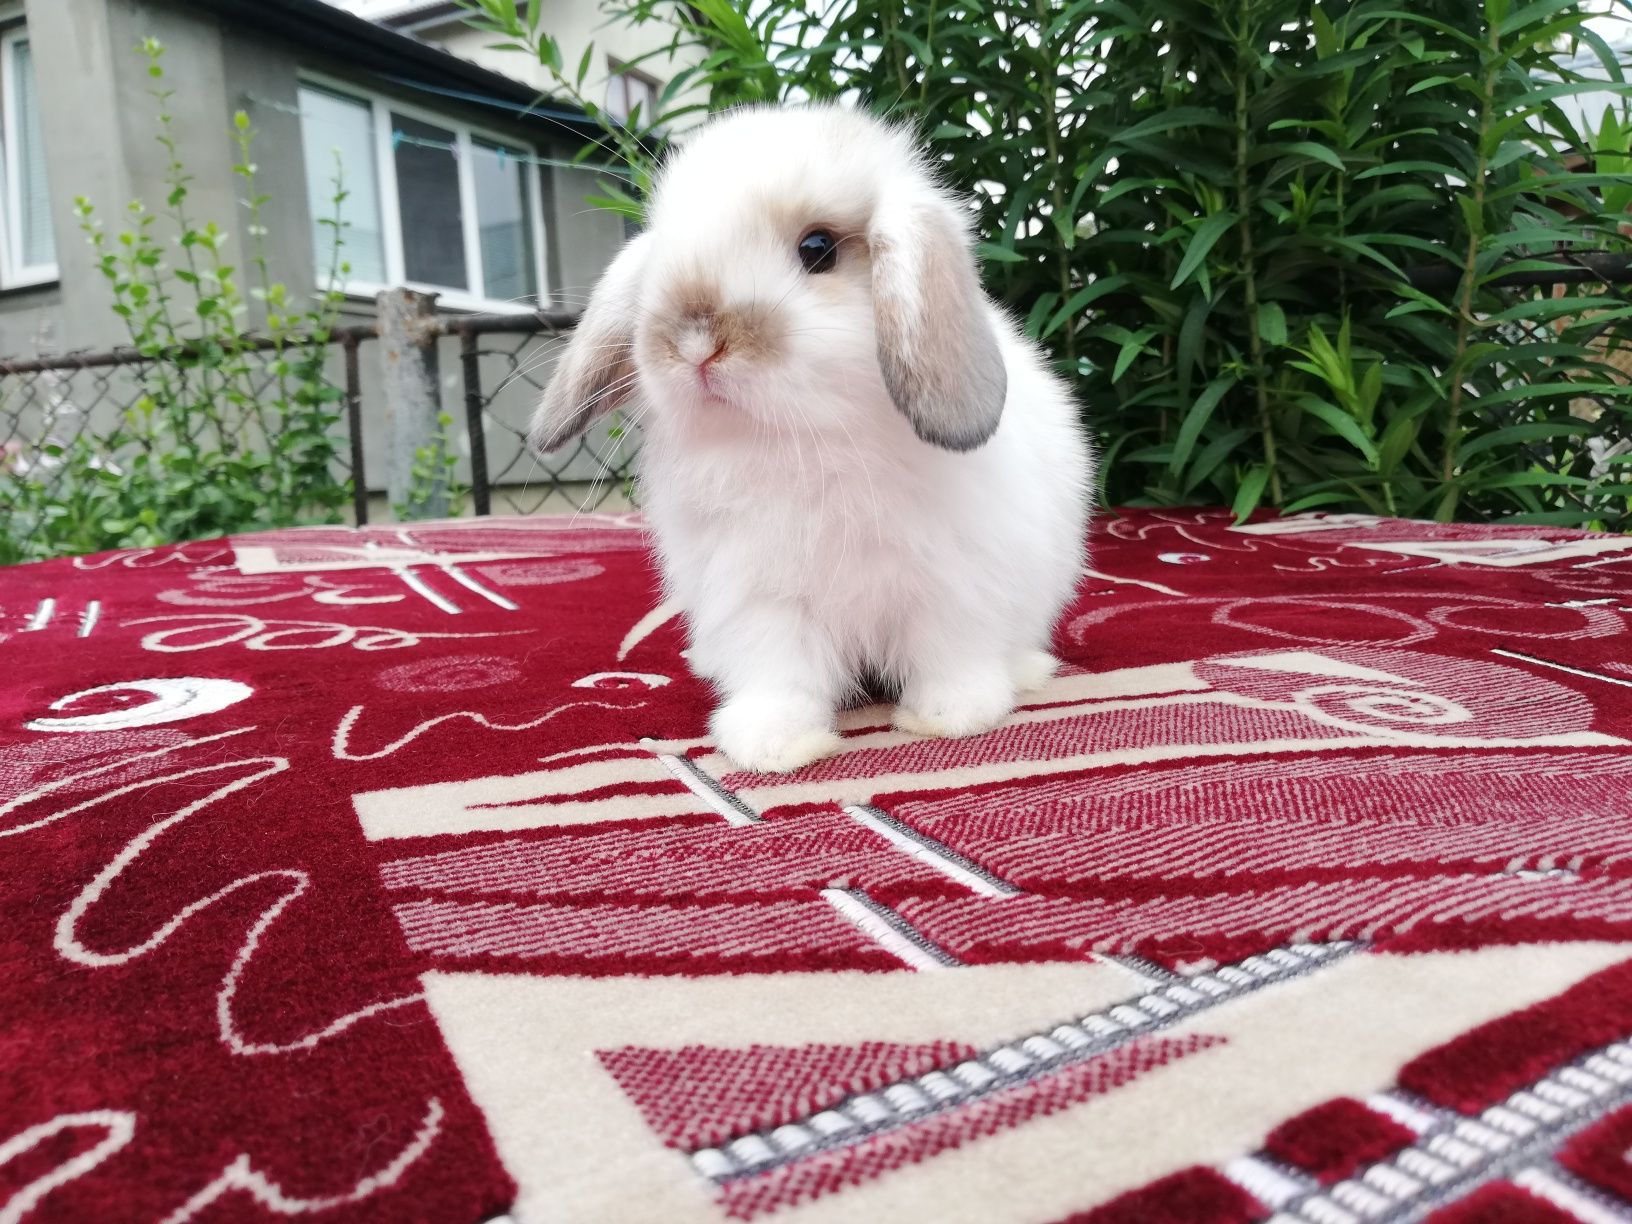 NHD. Нідерландський висловухий кролик. Карликовий баранчик.